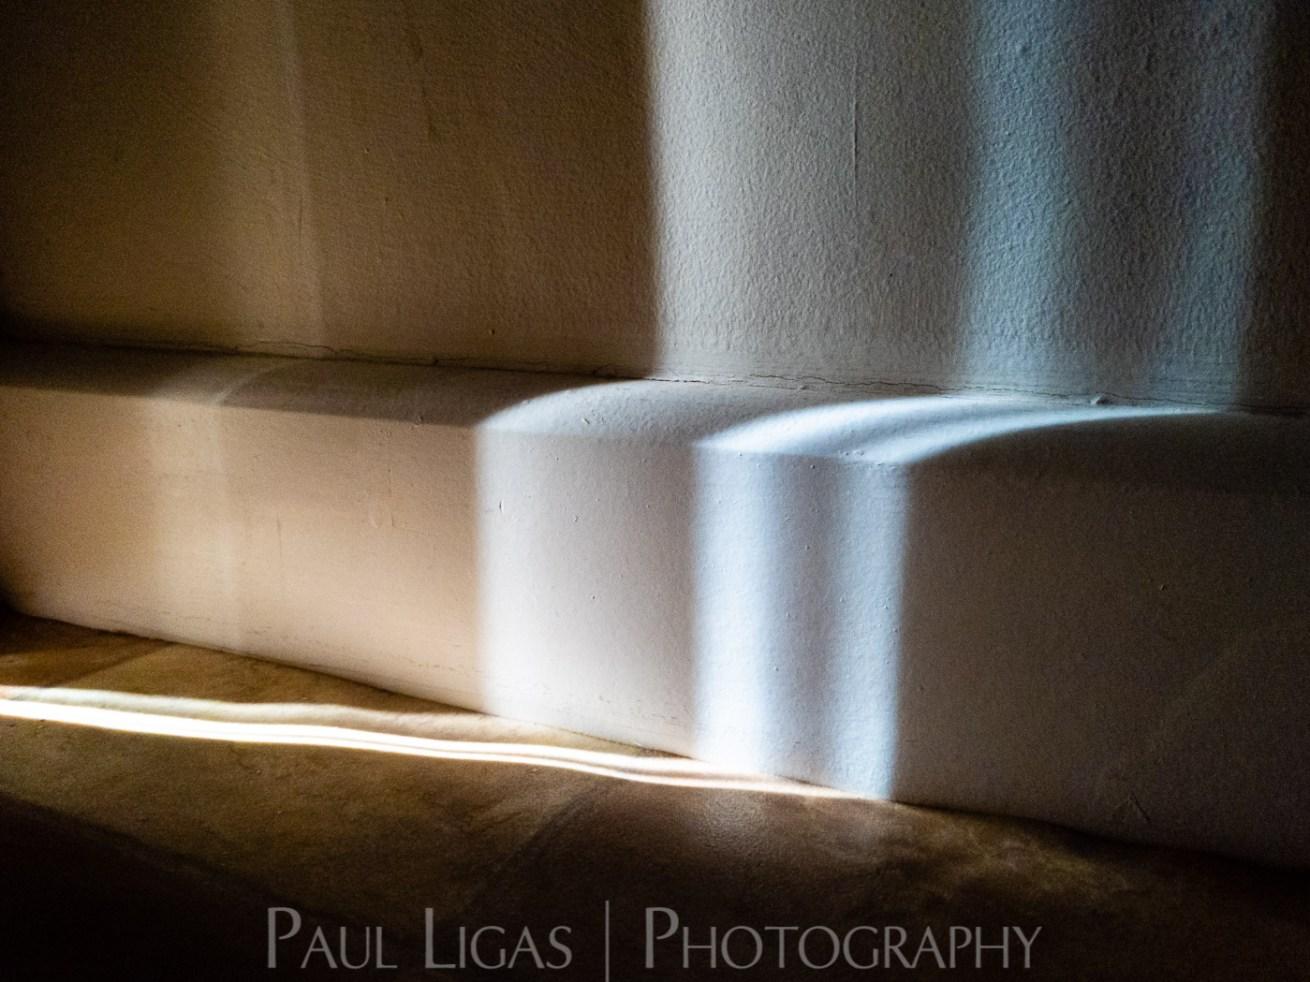 photos from inside a lockdown part 11 paul ligas photography hereford ledbury-172243